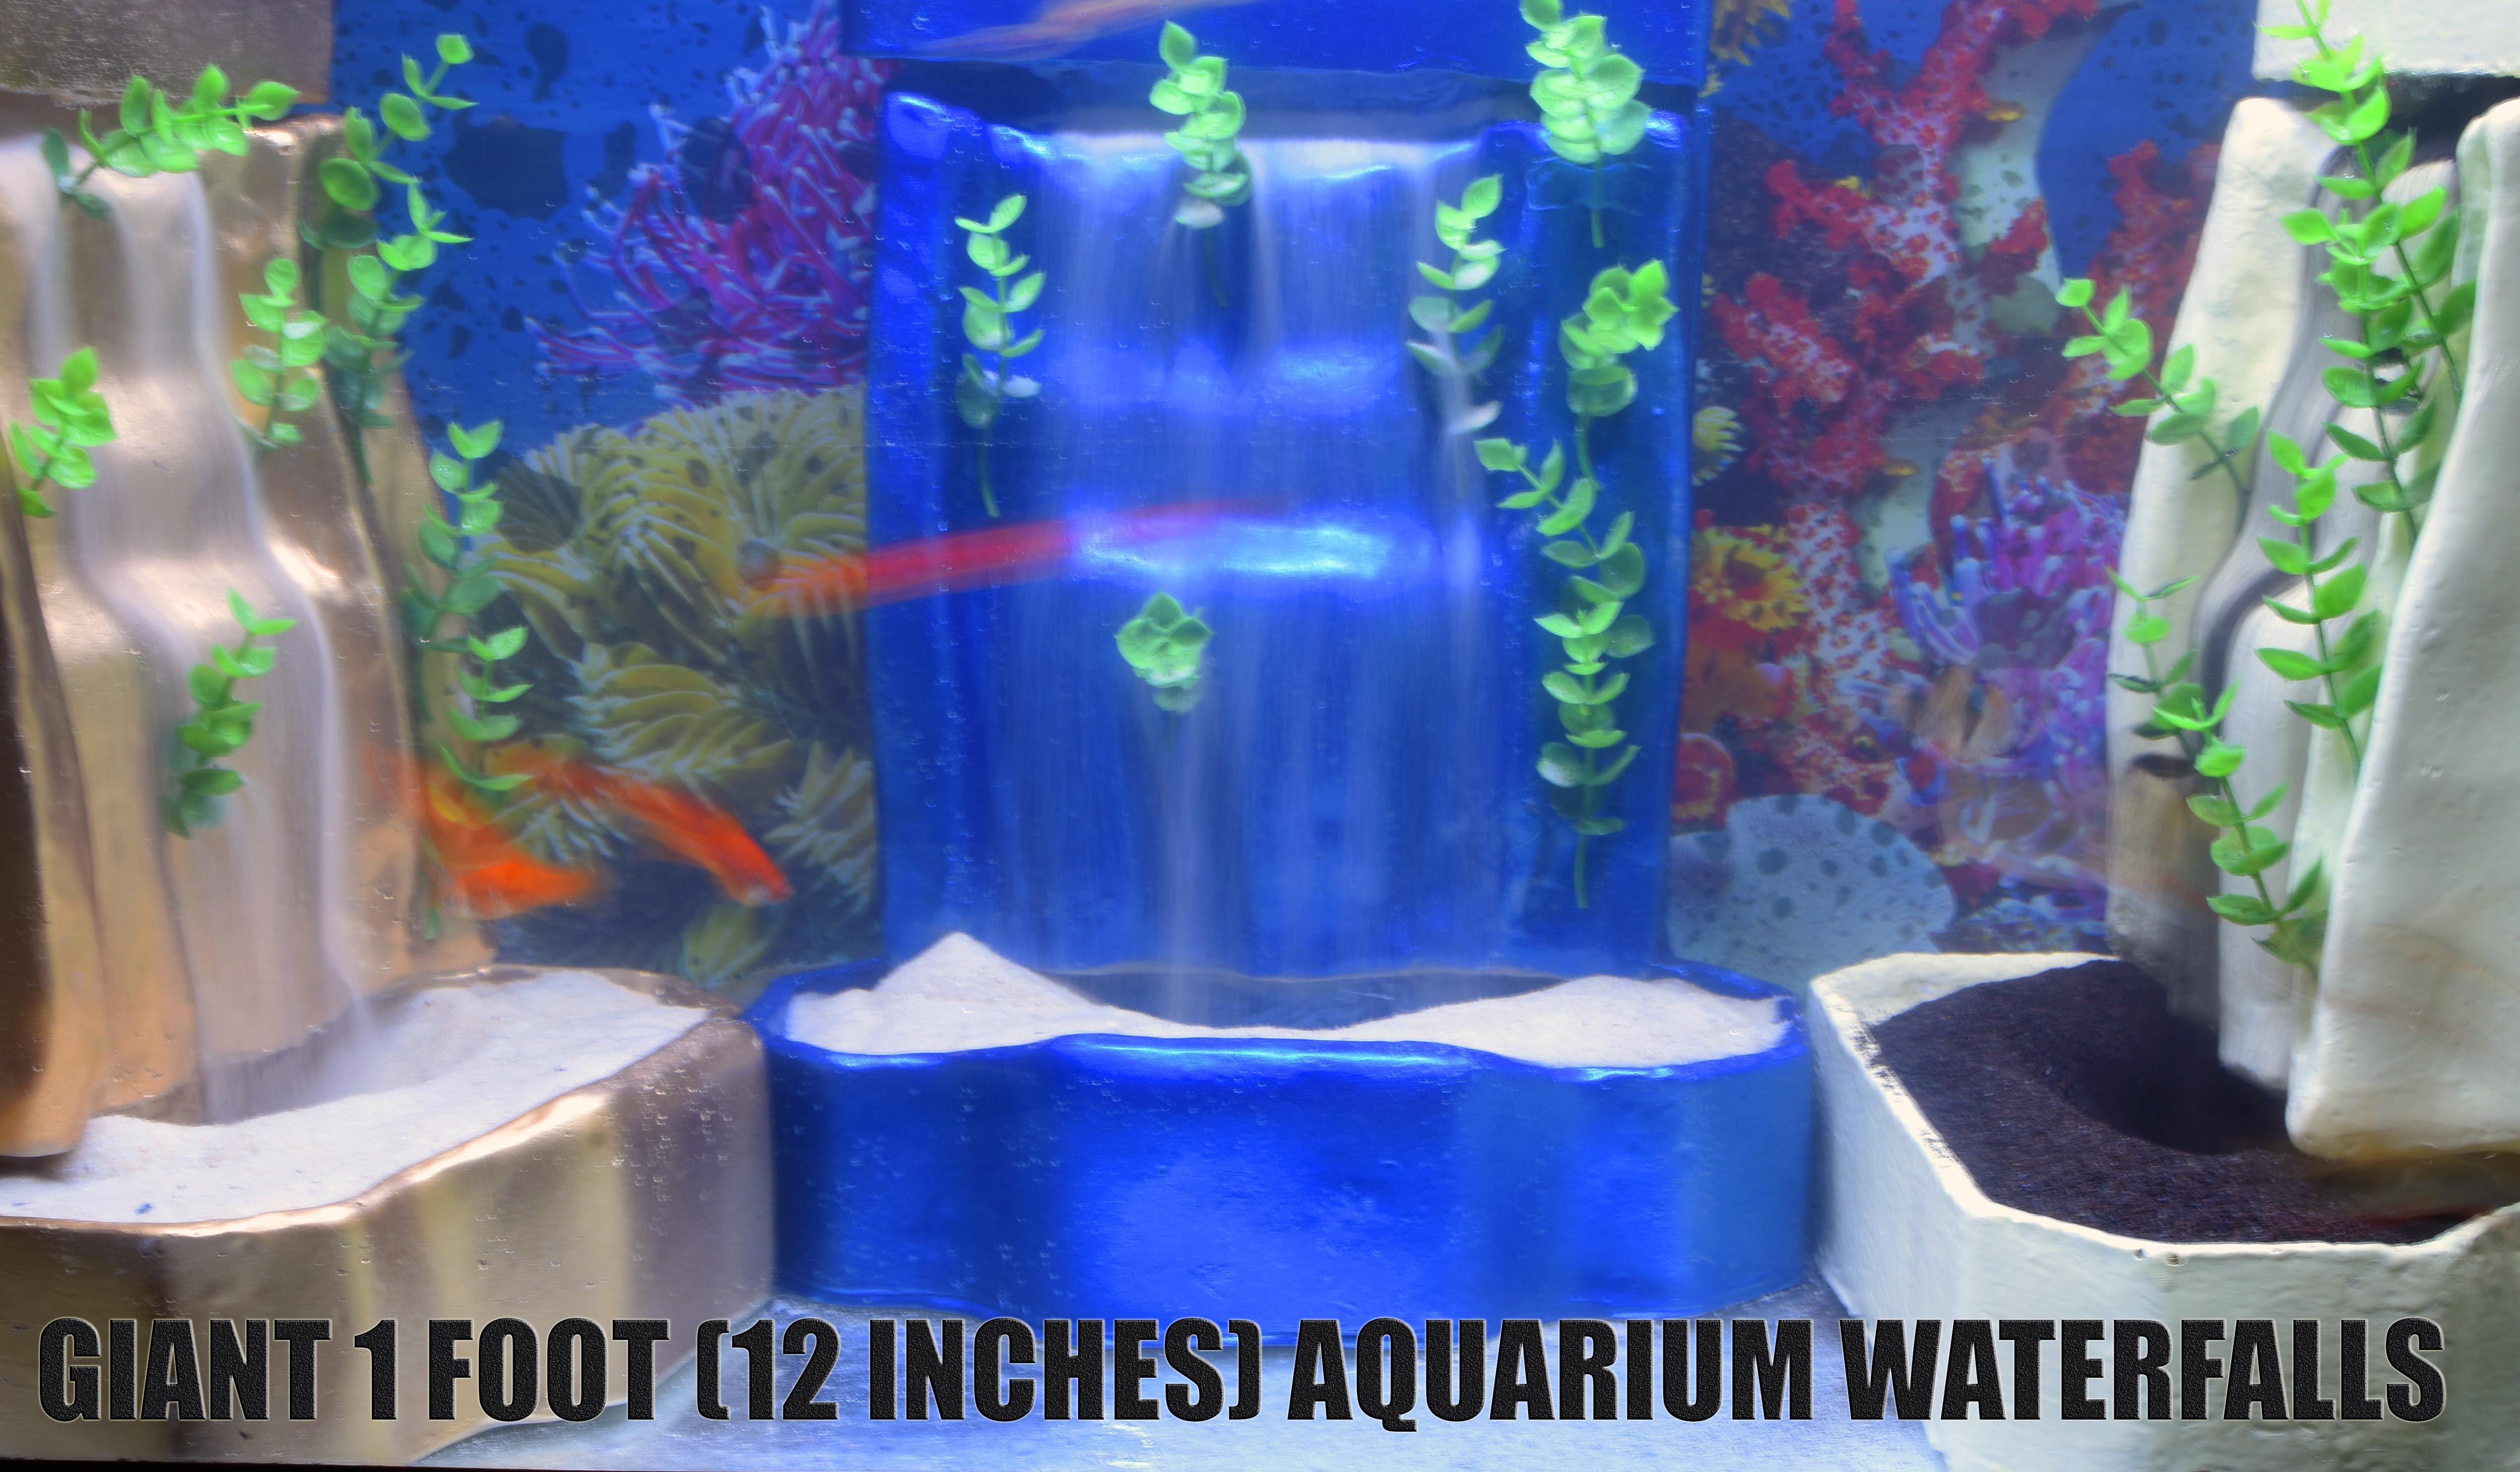 Download 97+ Background Aquarium Arwana HD Gratis